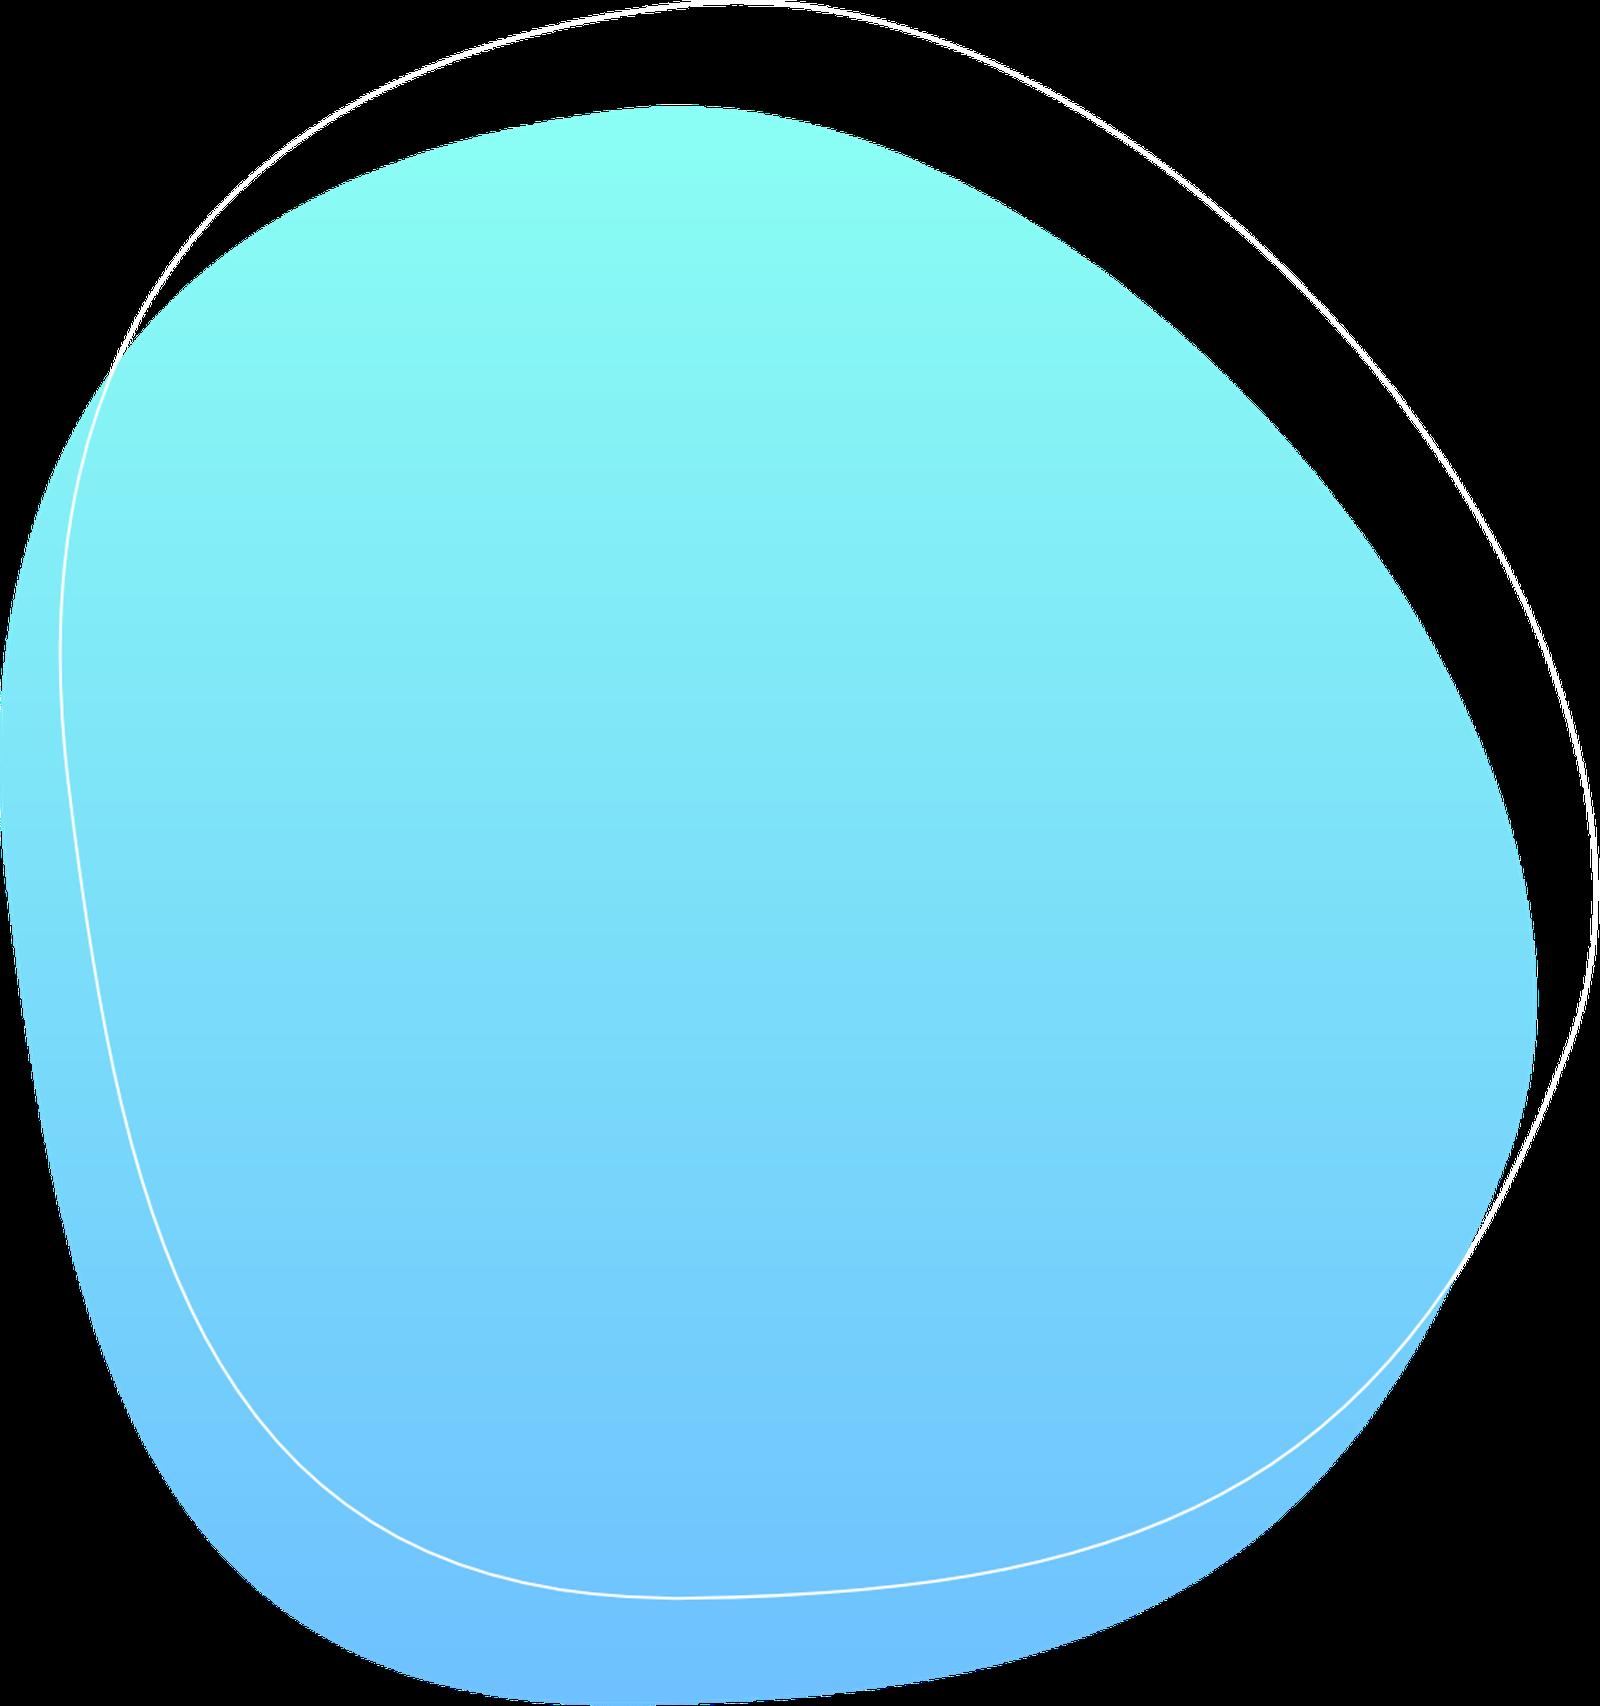 bulle bleu Sleeq